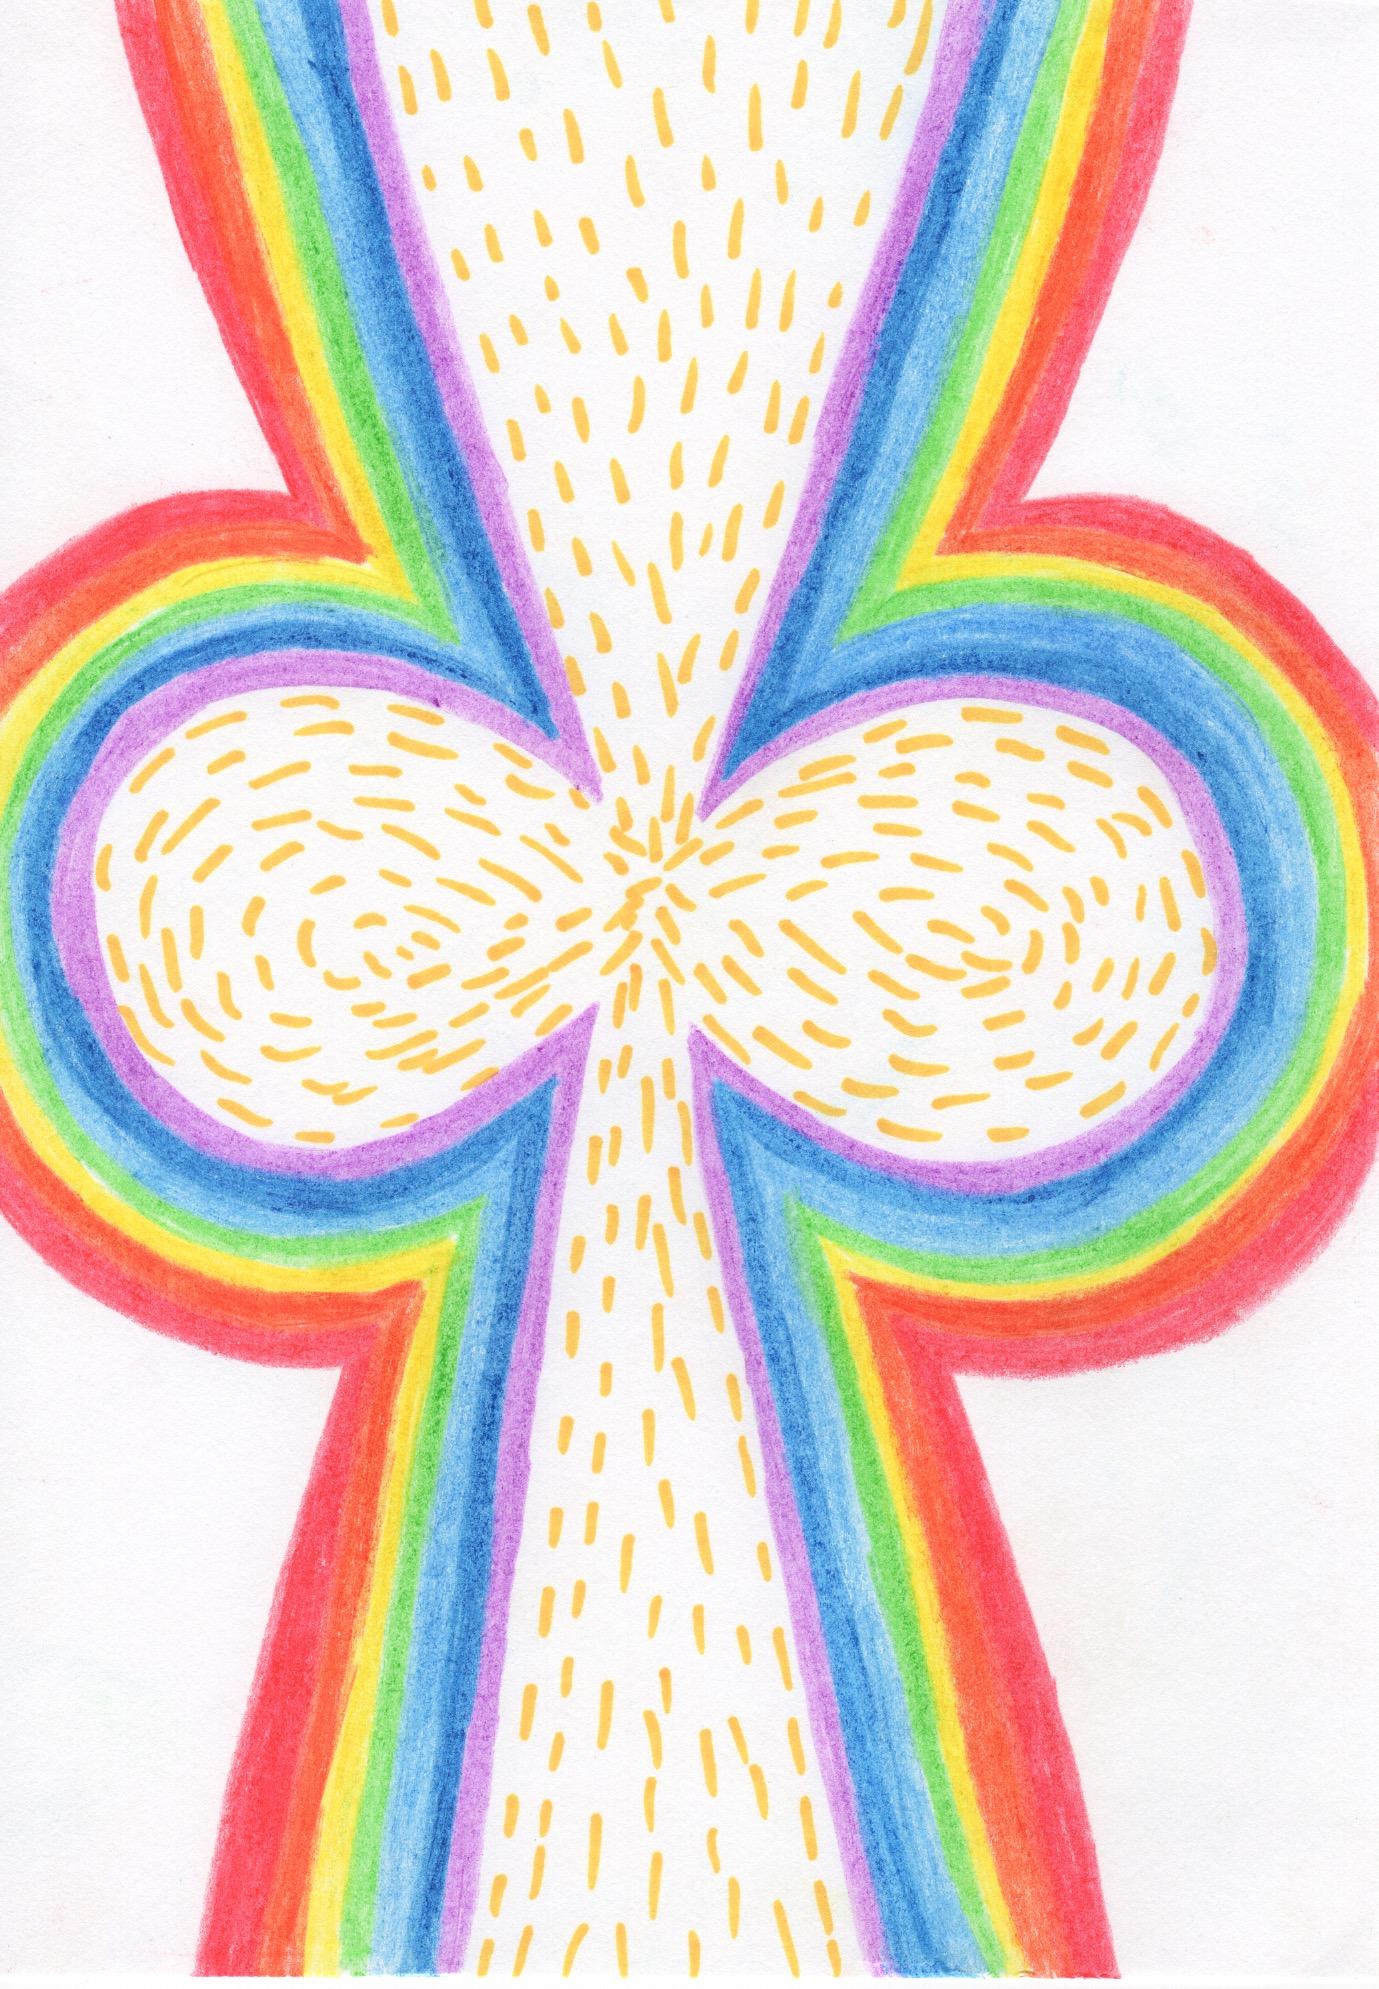 Artwork Created By Sarah H Nicotra